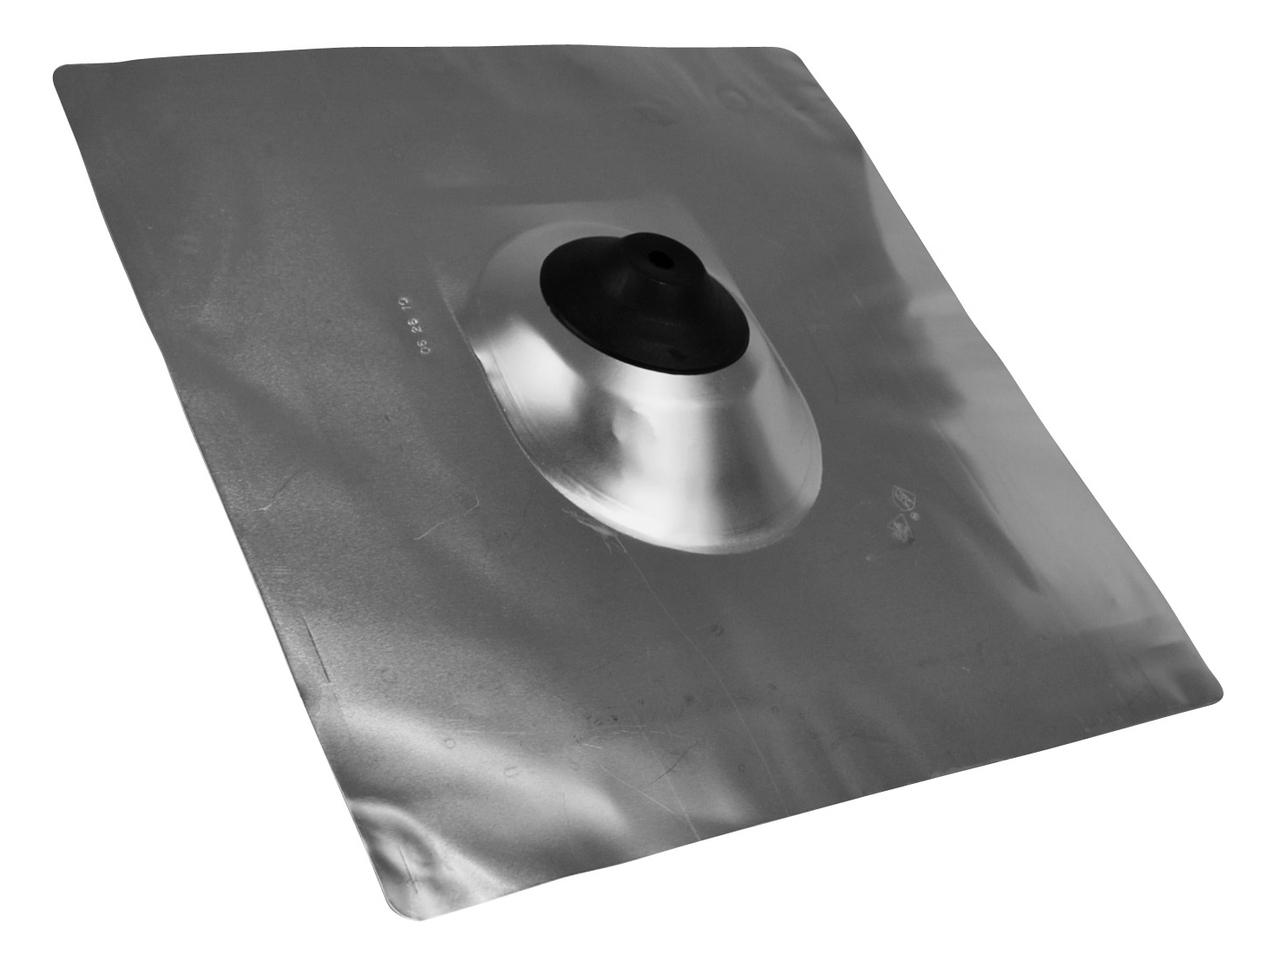 Oatey 11833 Alum Clear Flashing